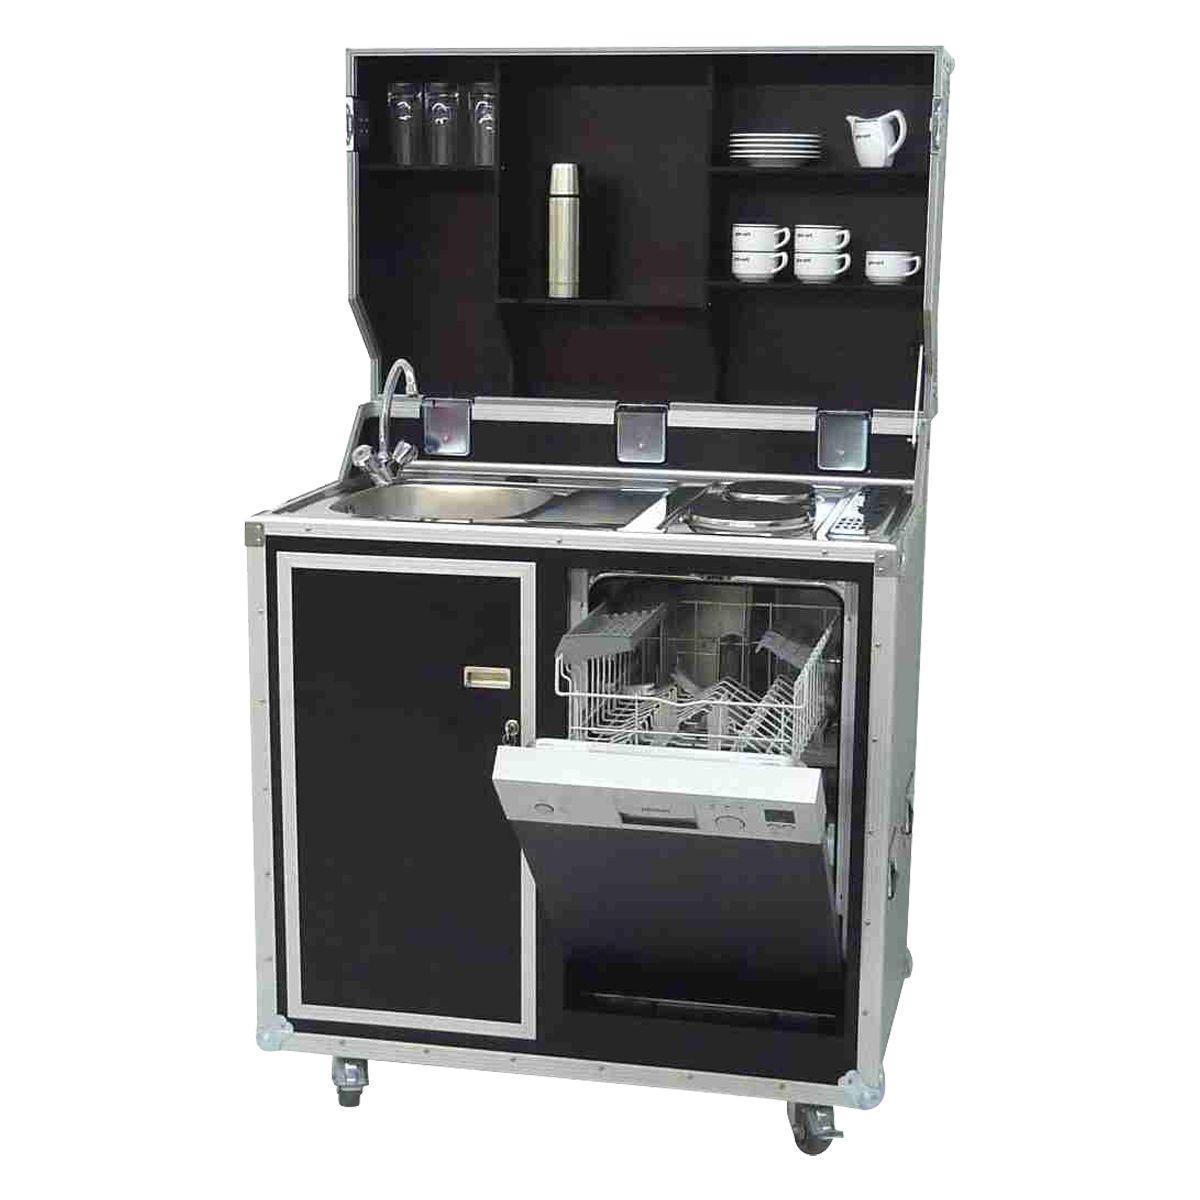 mobile Küche im Koffer inklusive Geschirrspüler, Farbe